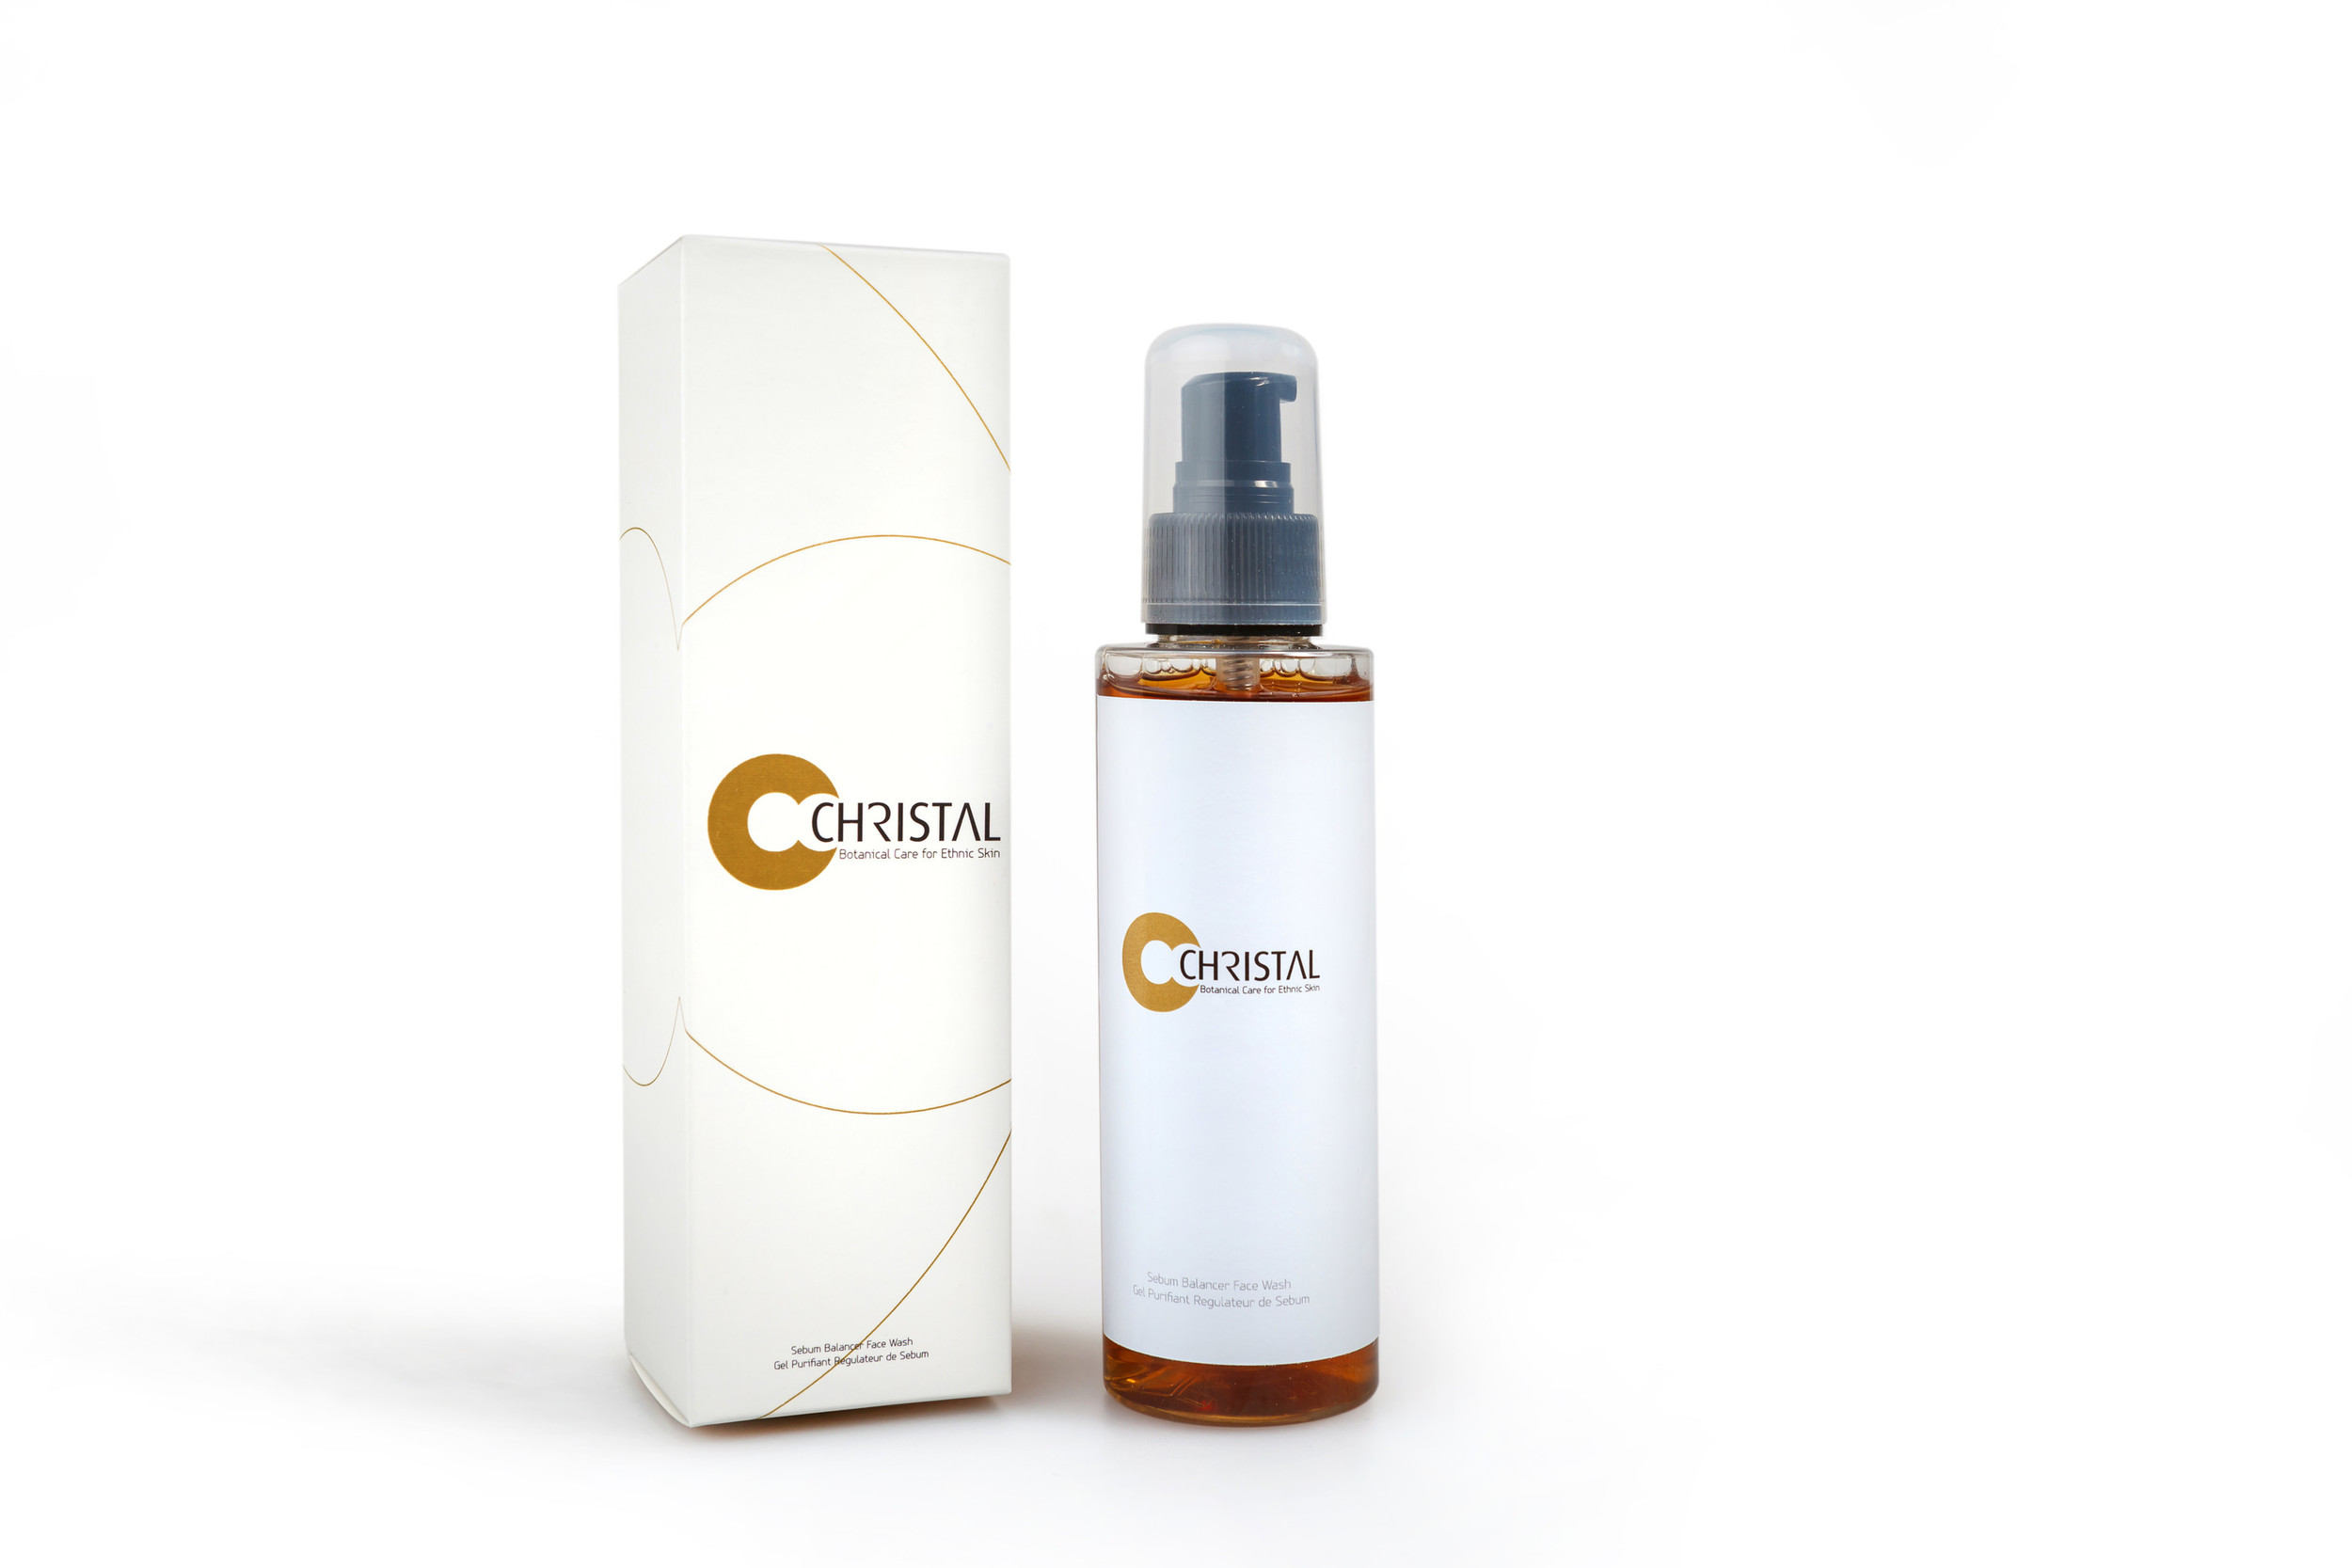 CHRISTAL Sebum Balancing Facial Wash